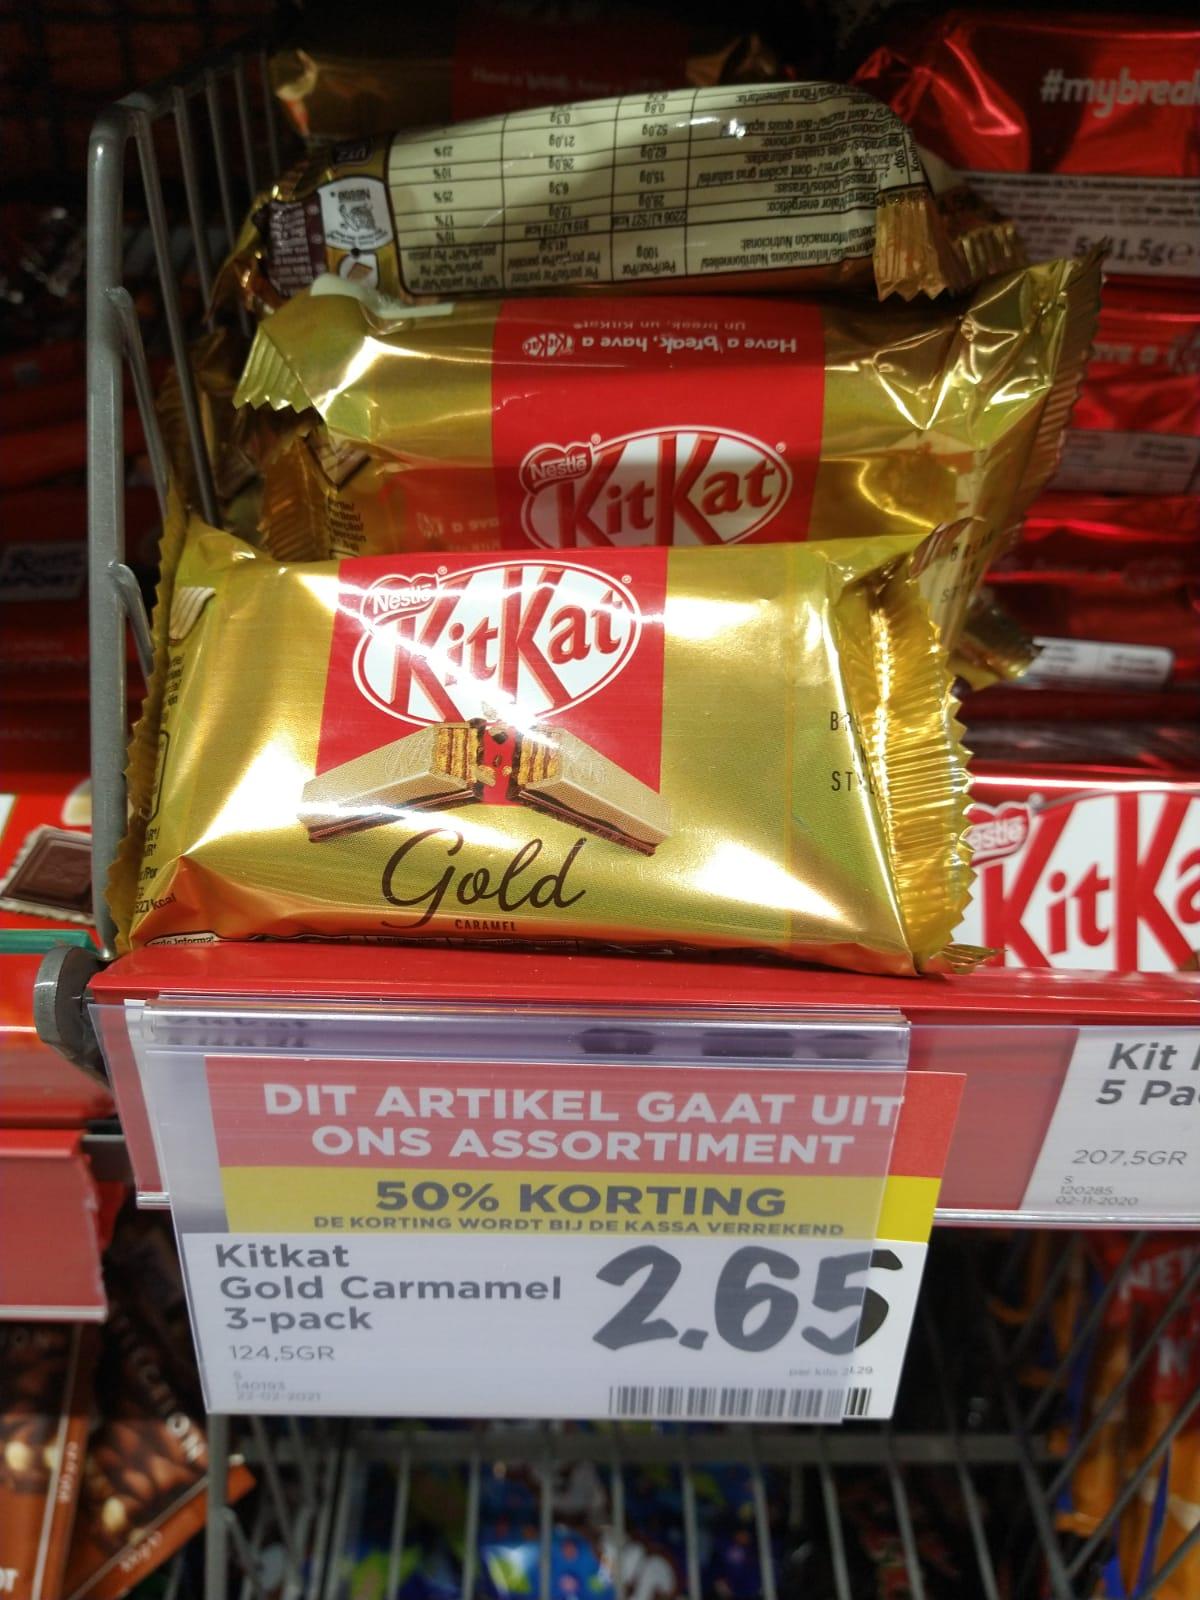 [Vomar - Castricum] KitKat Gold Caramel 3-pack